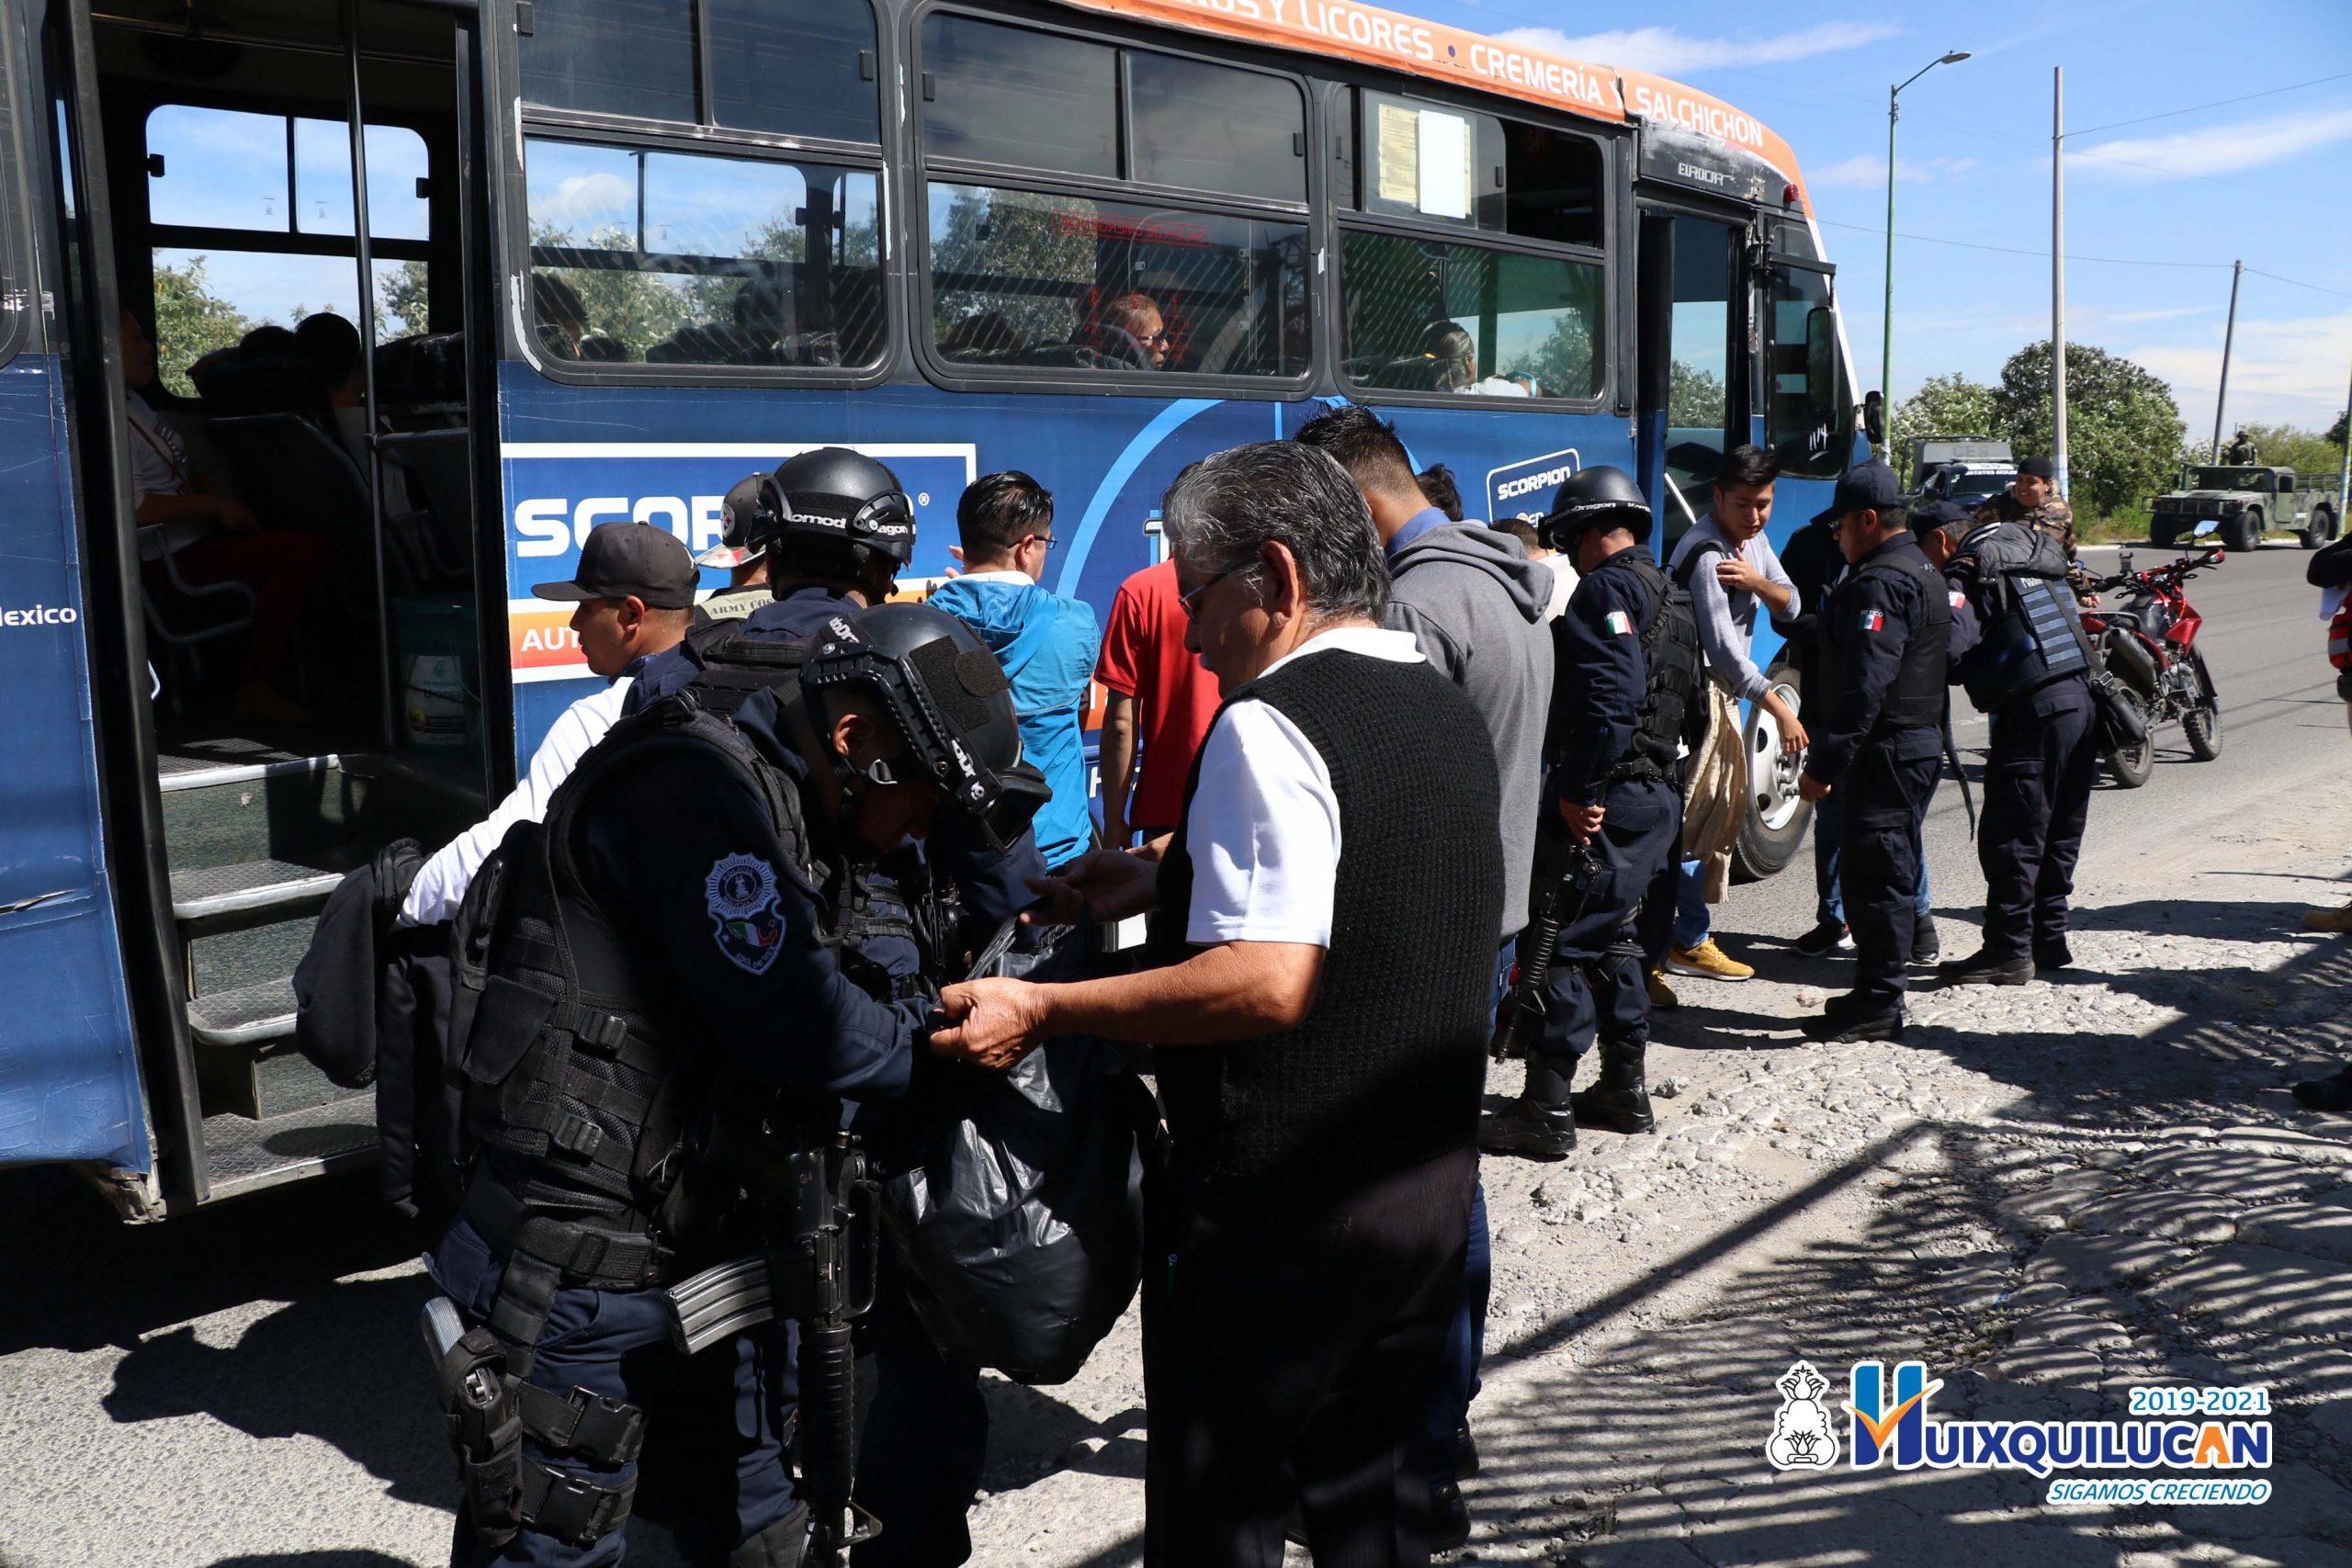 Baja robo en transporte público en Huixquilucan